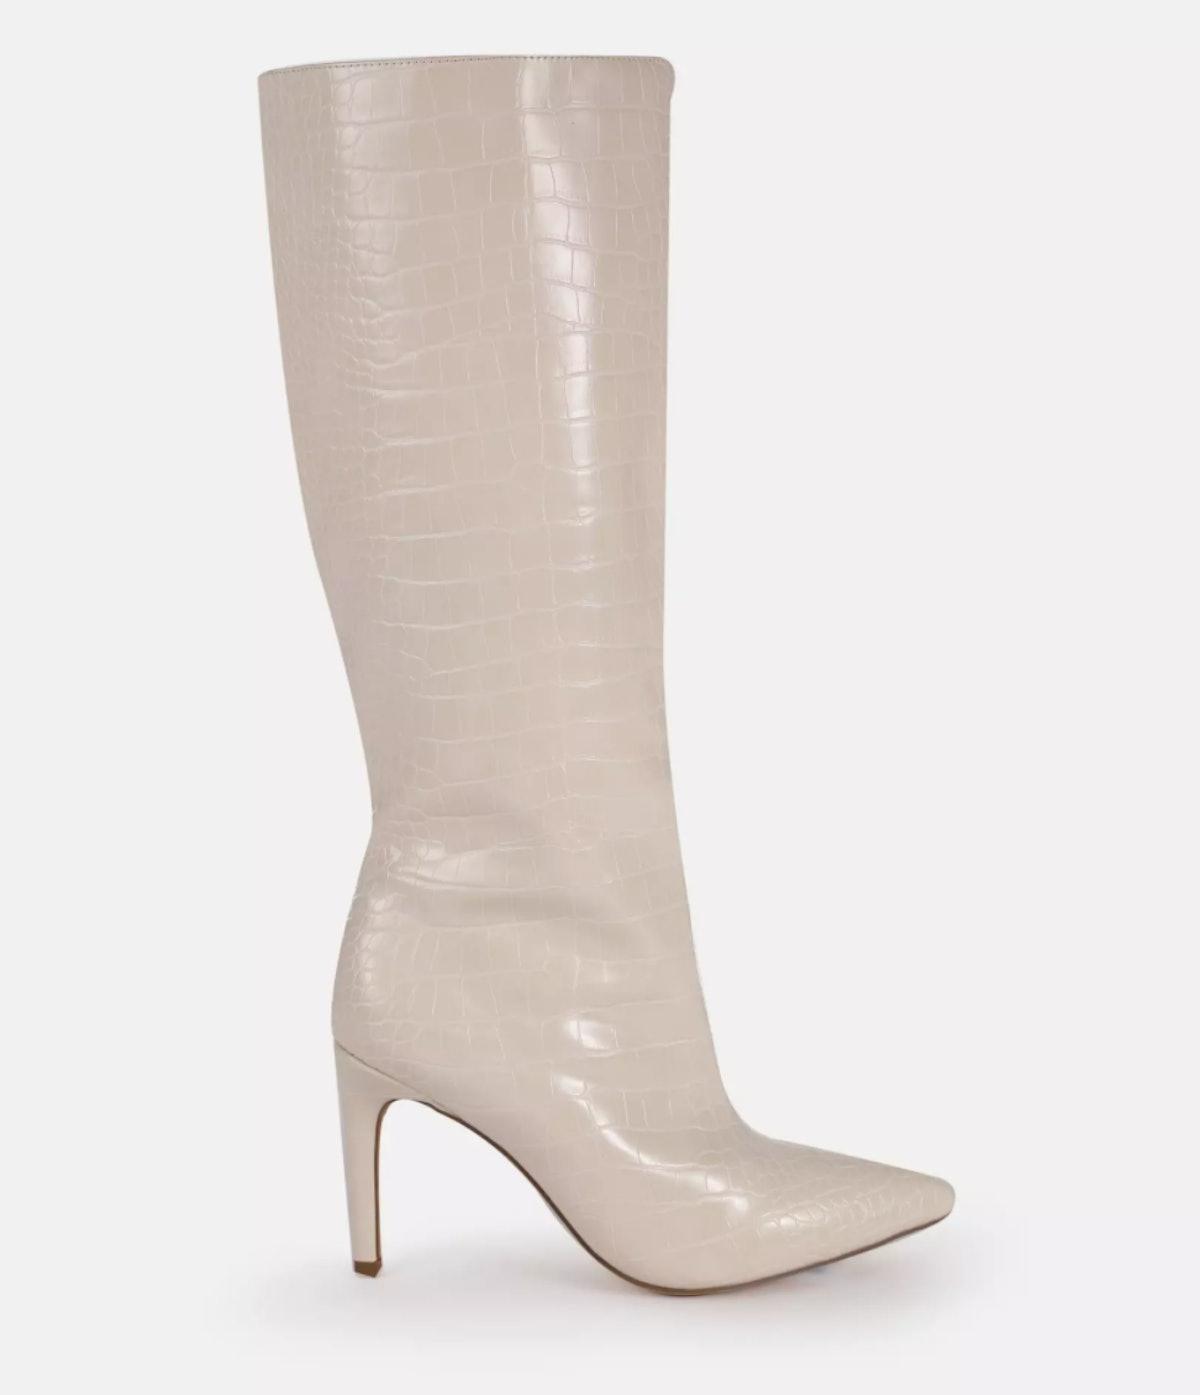 Cream Mock Croc Tubular Calf Stiletto Boots